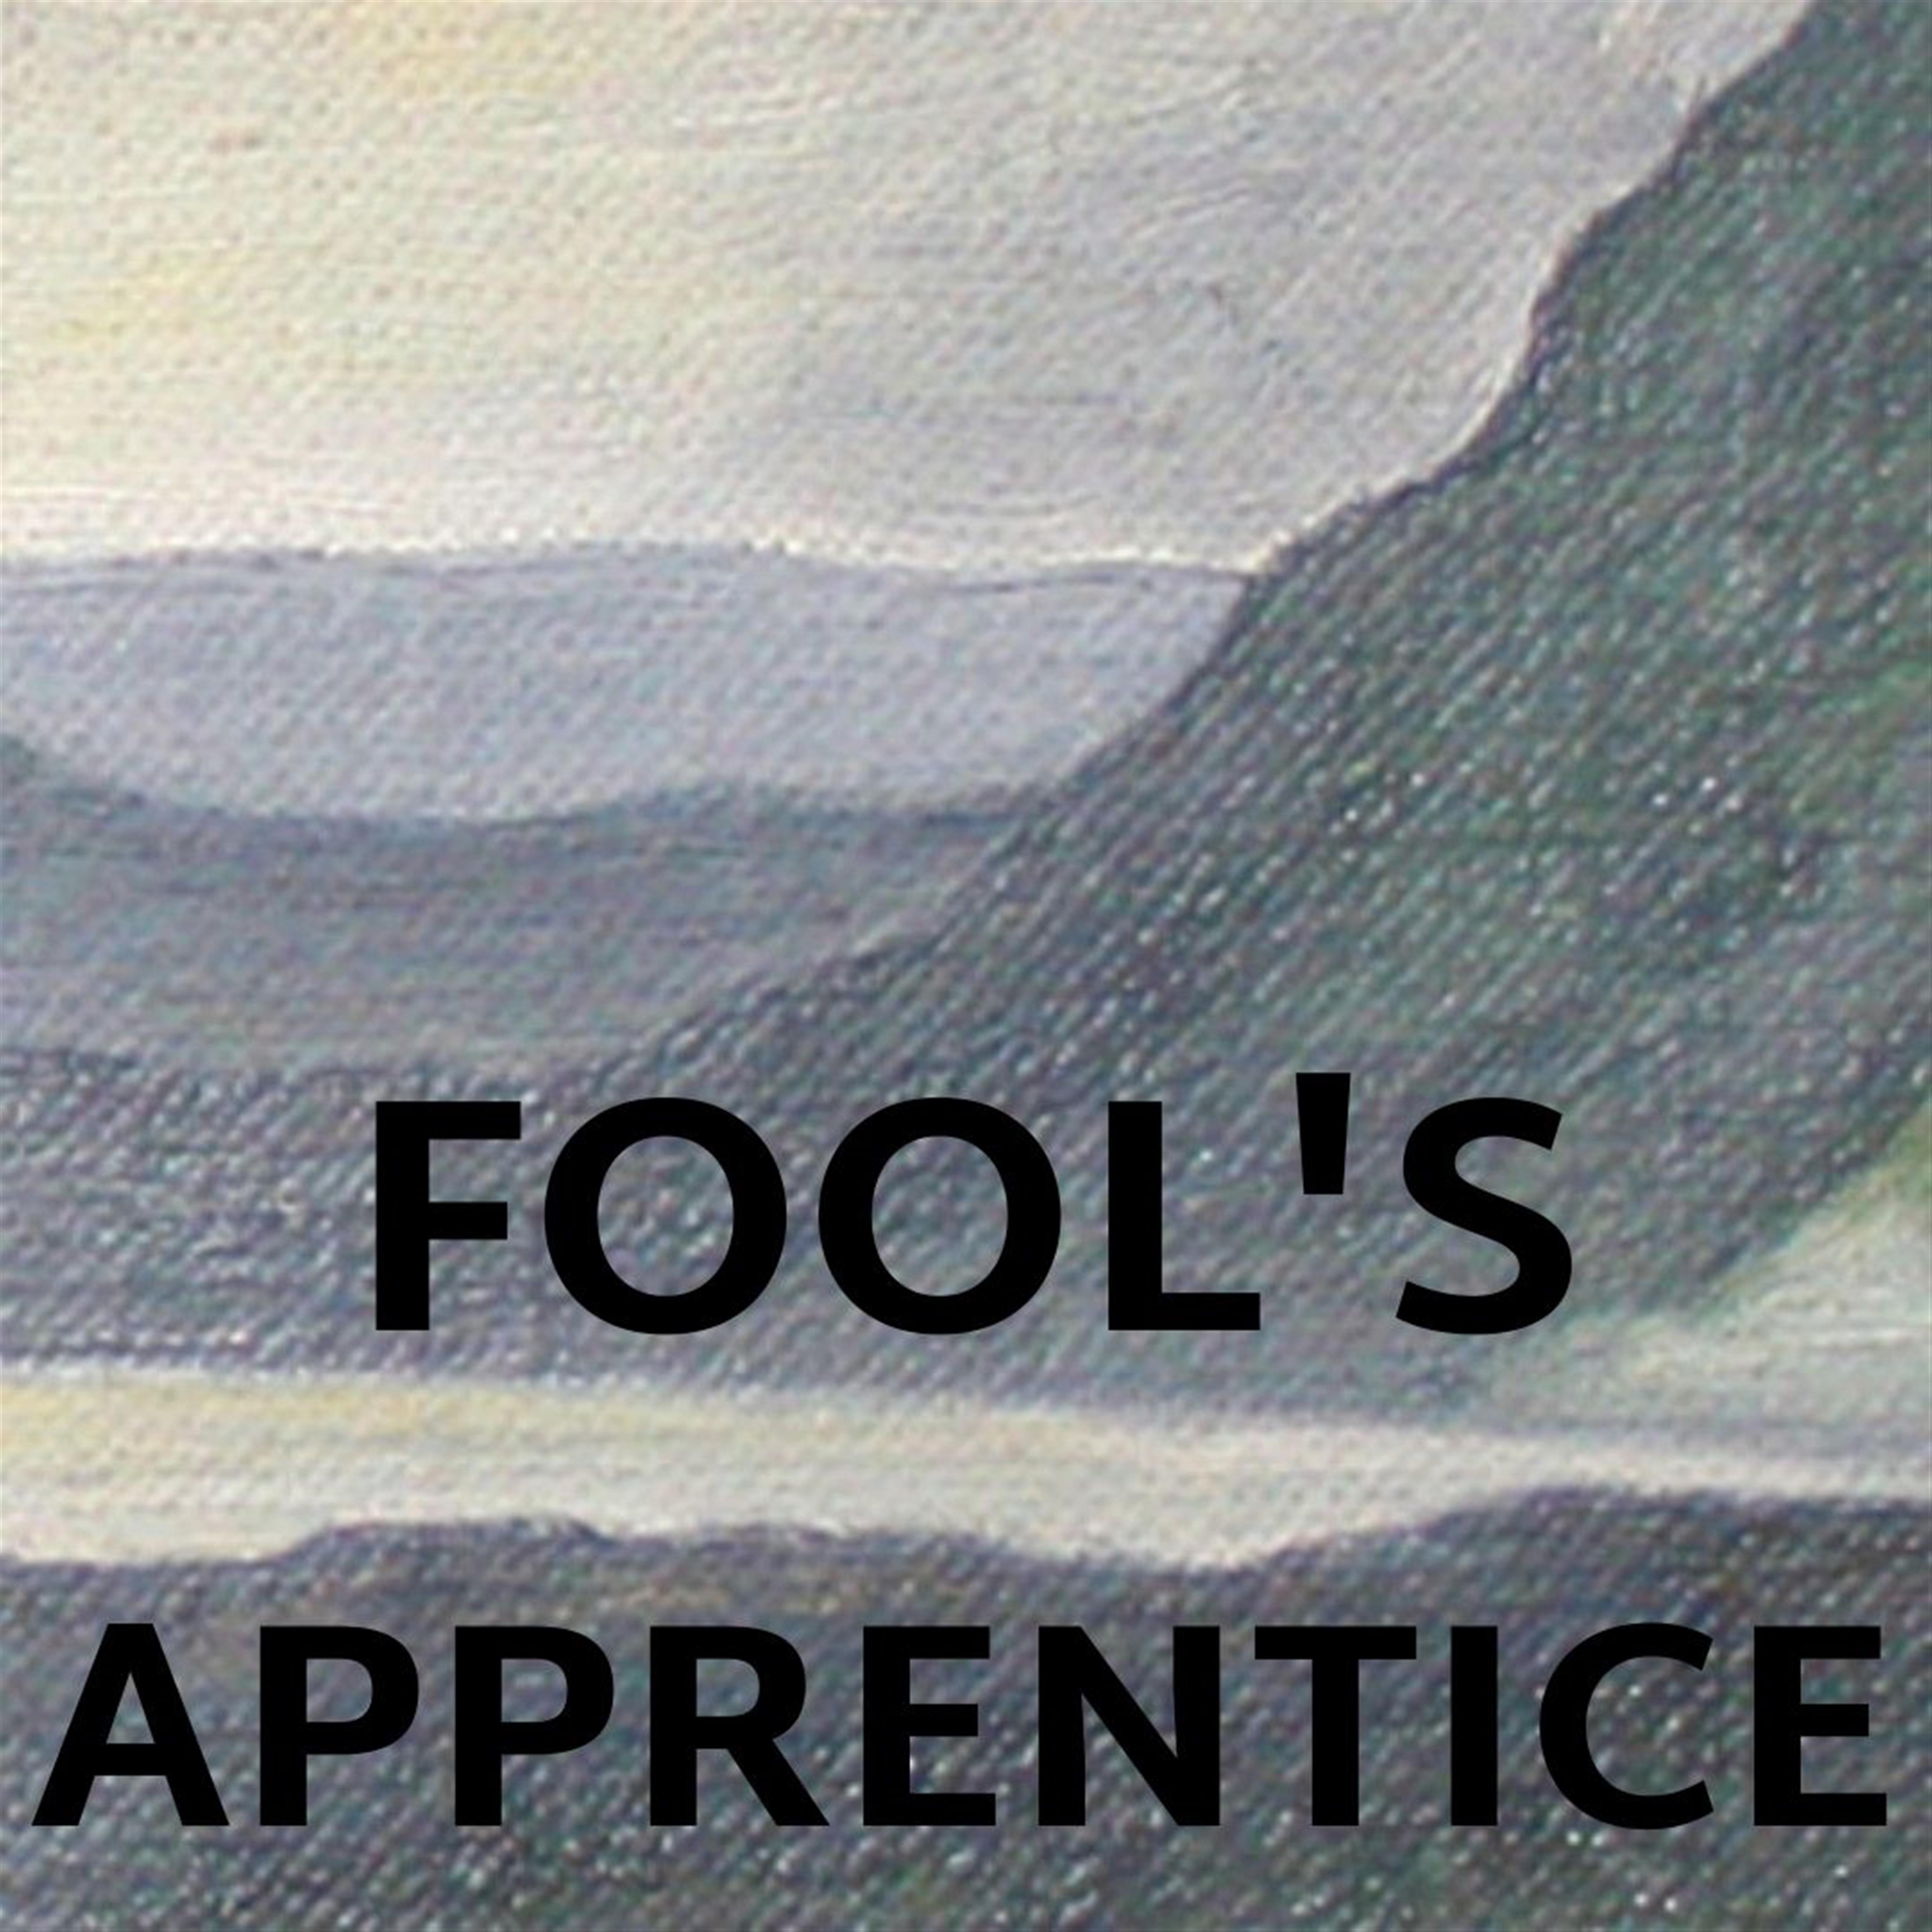 Fool's Apprentice